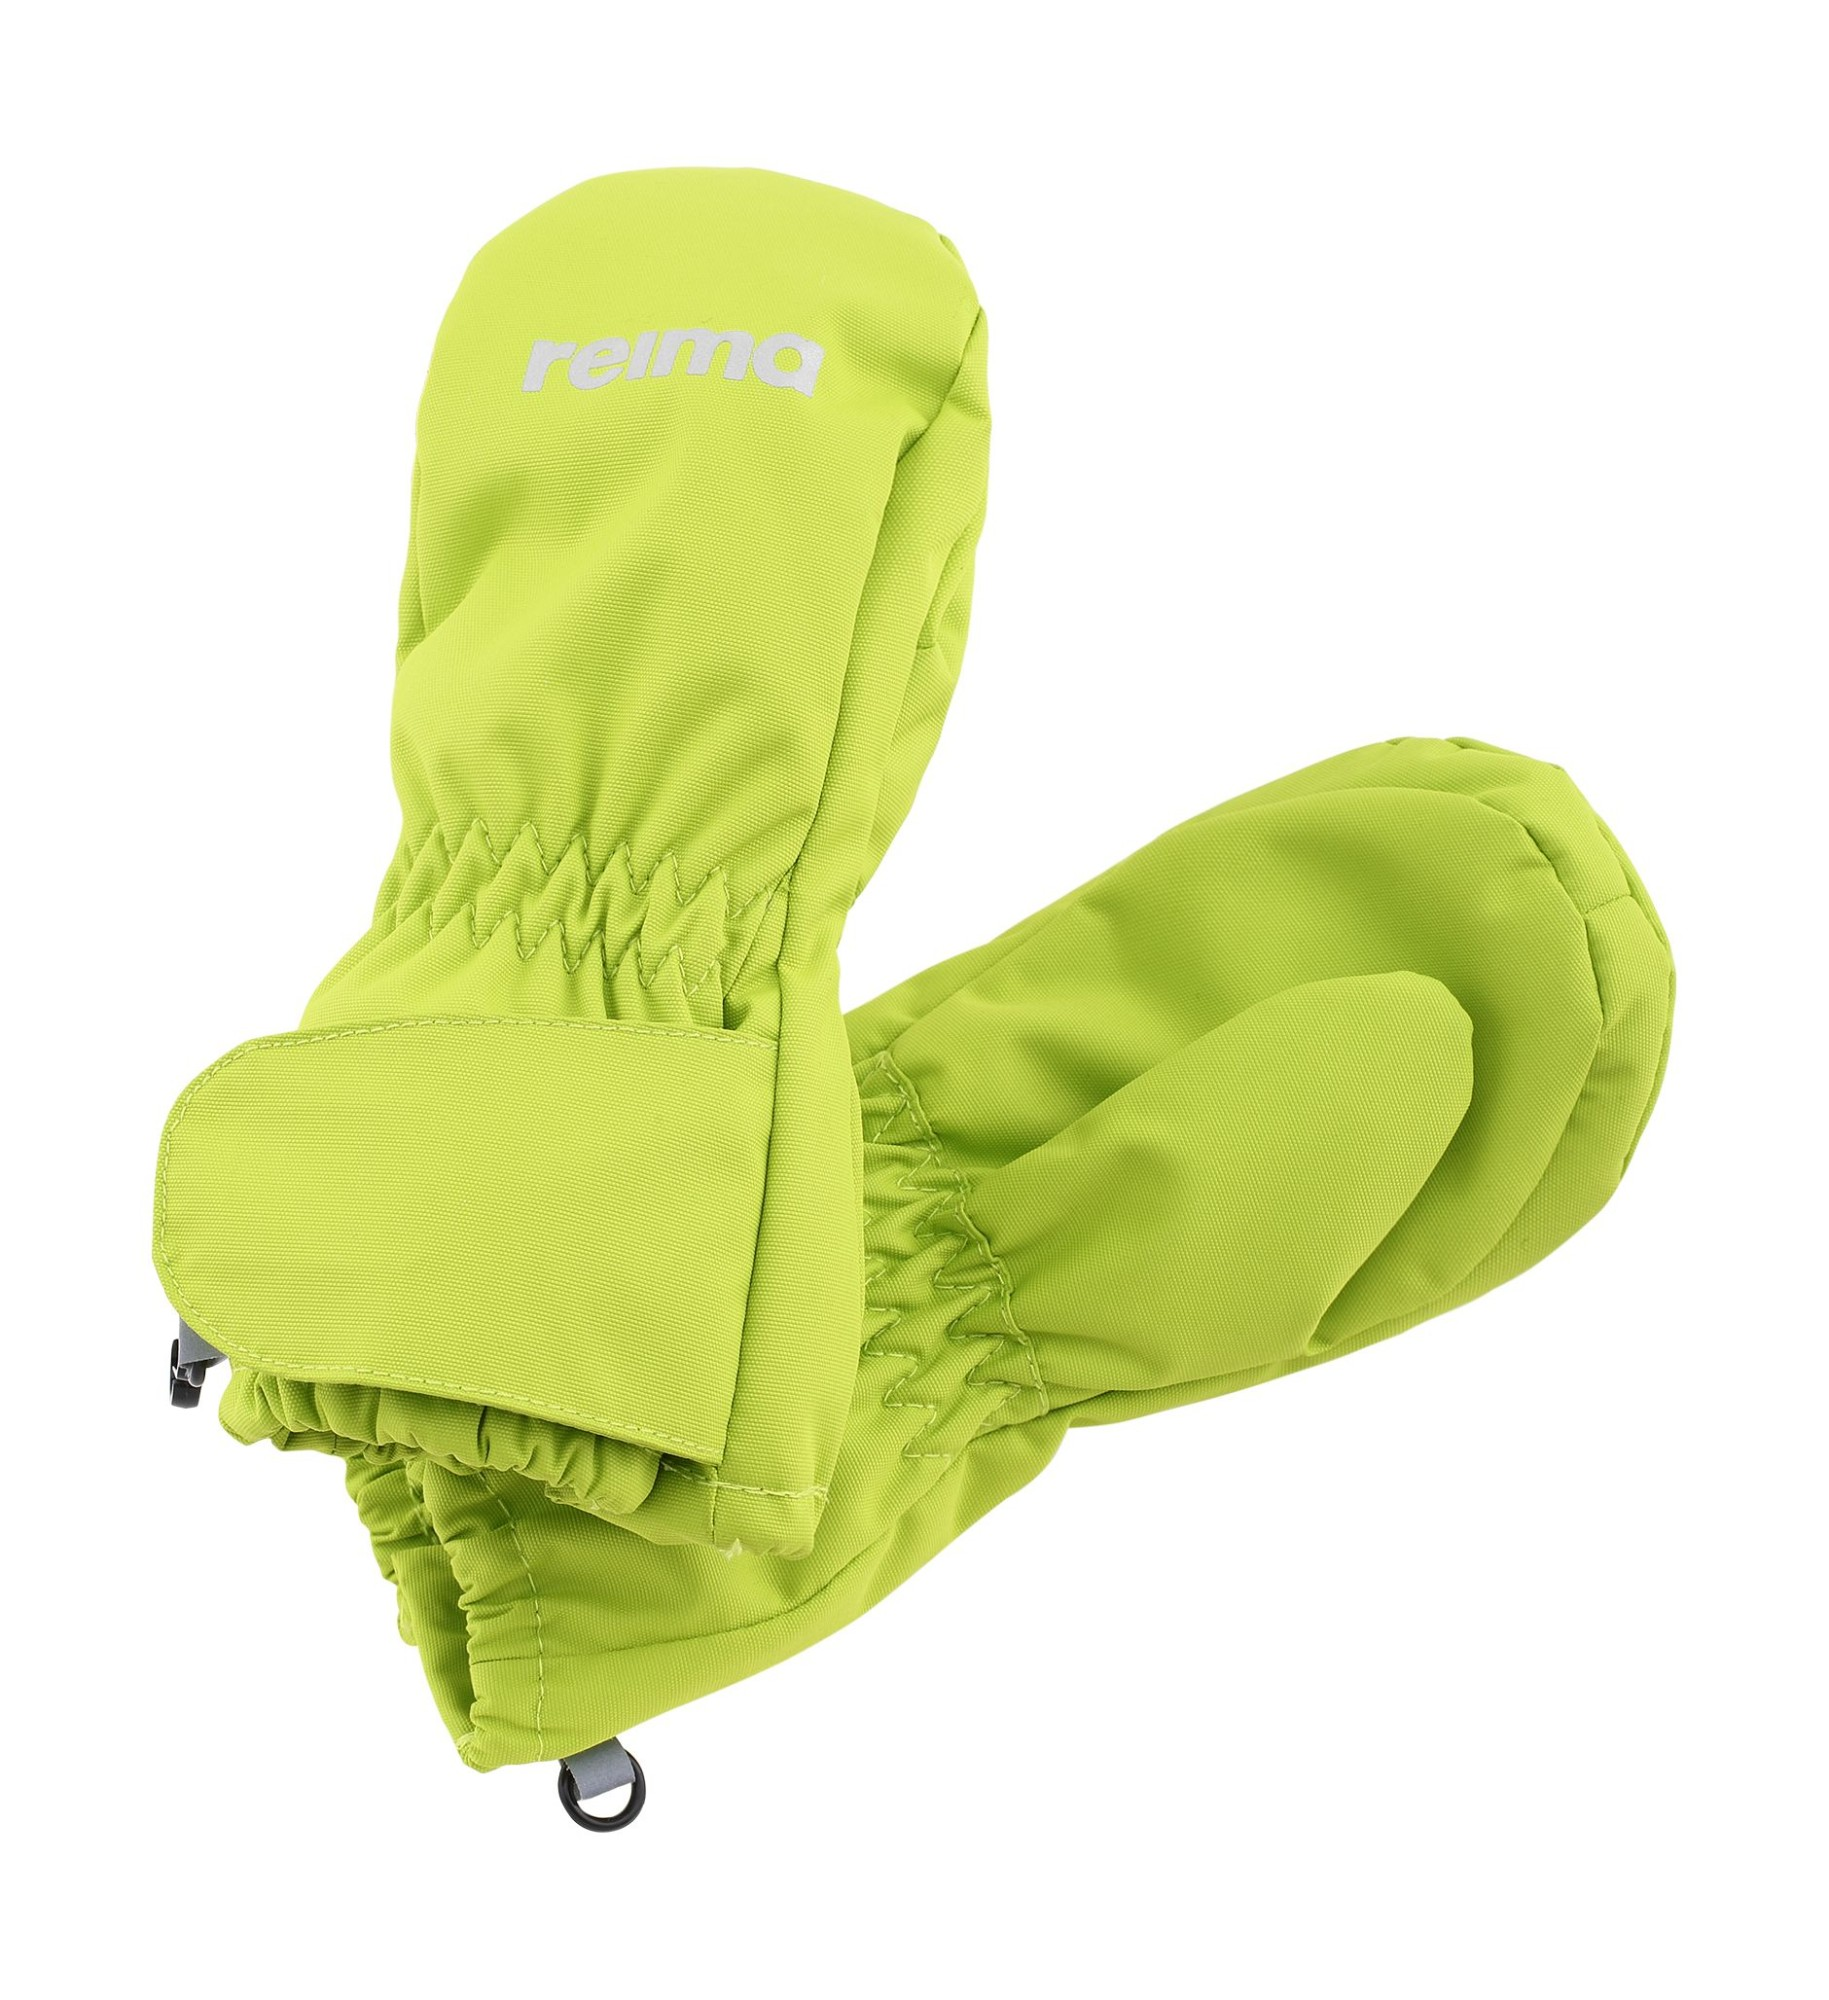 REIMA Avaus Lime Green 2